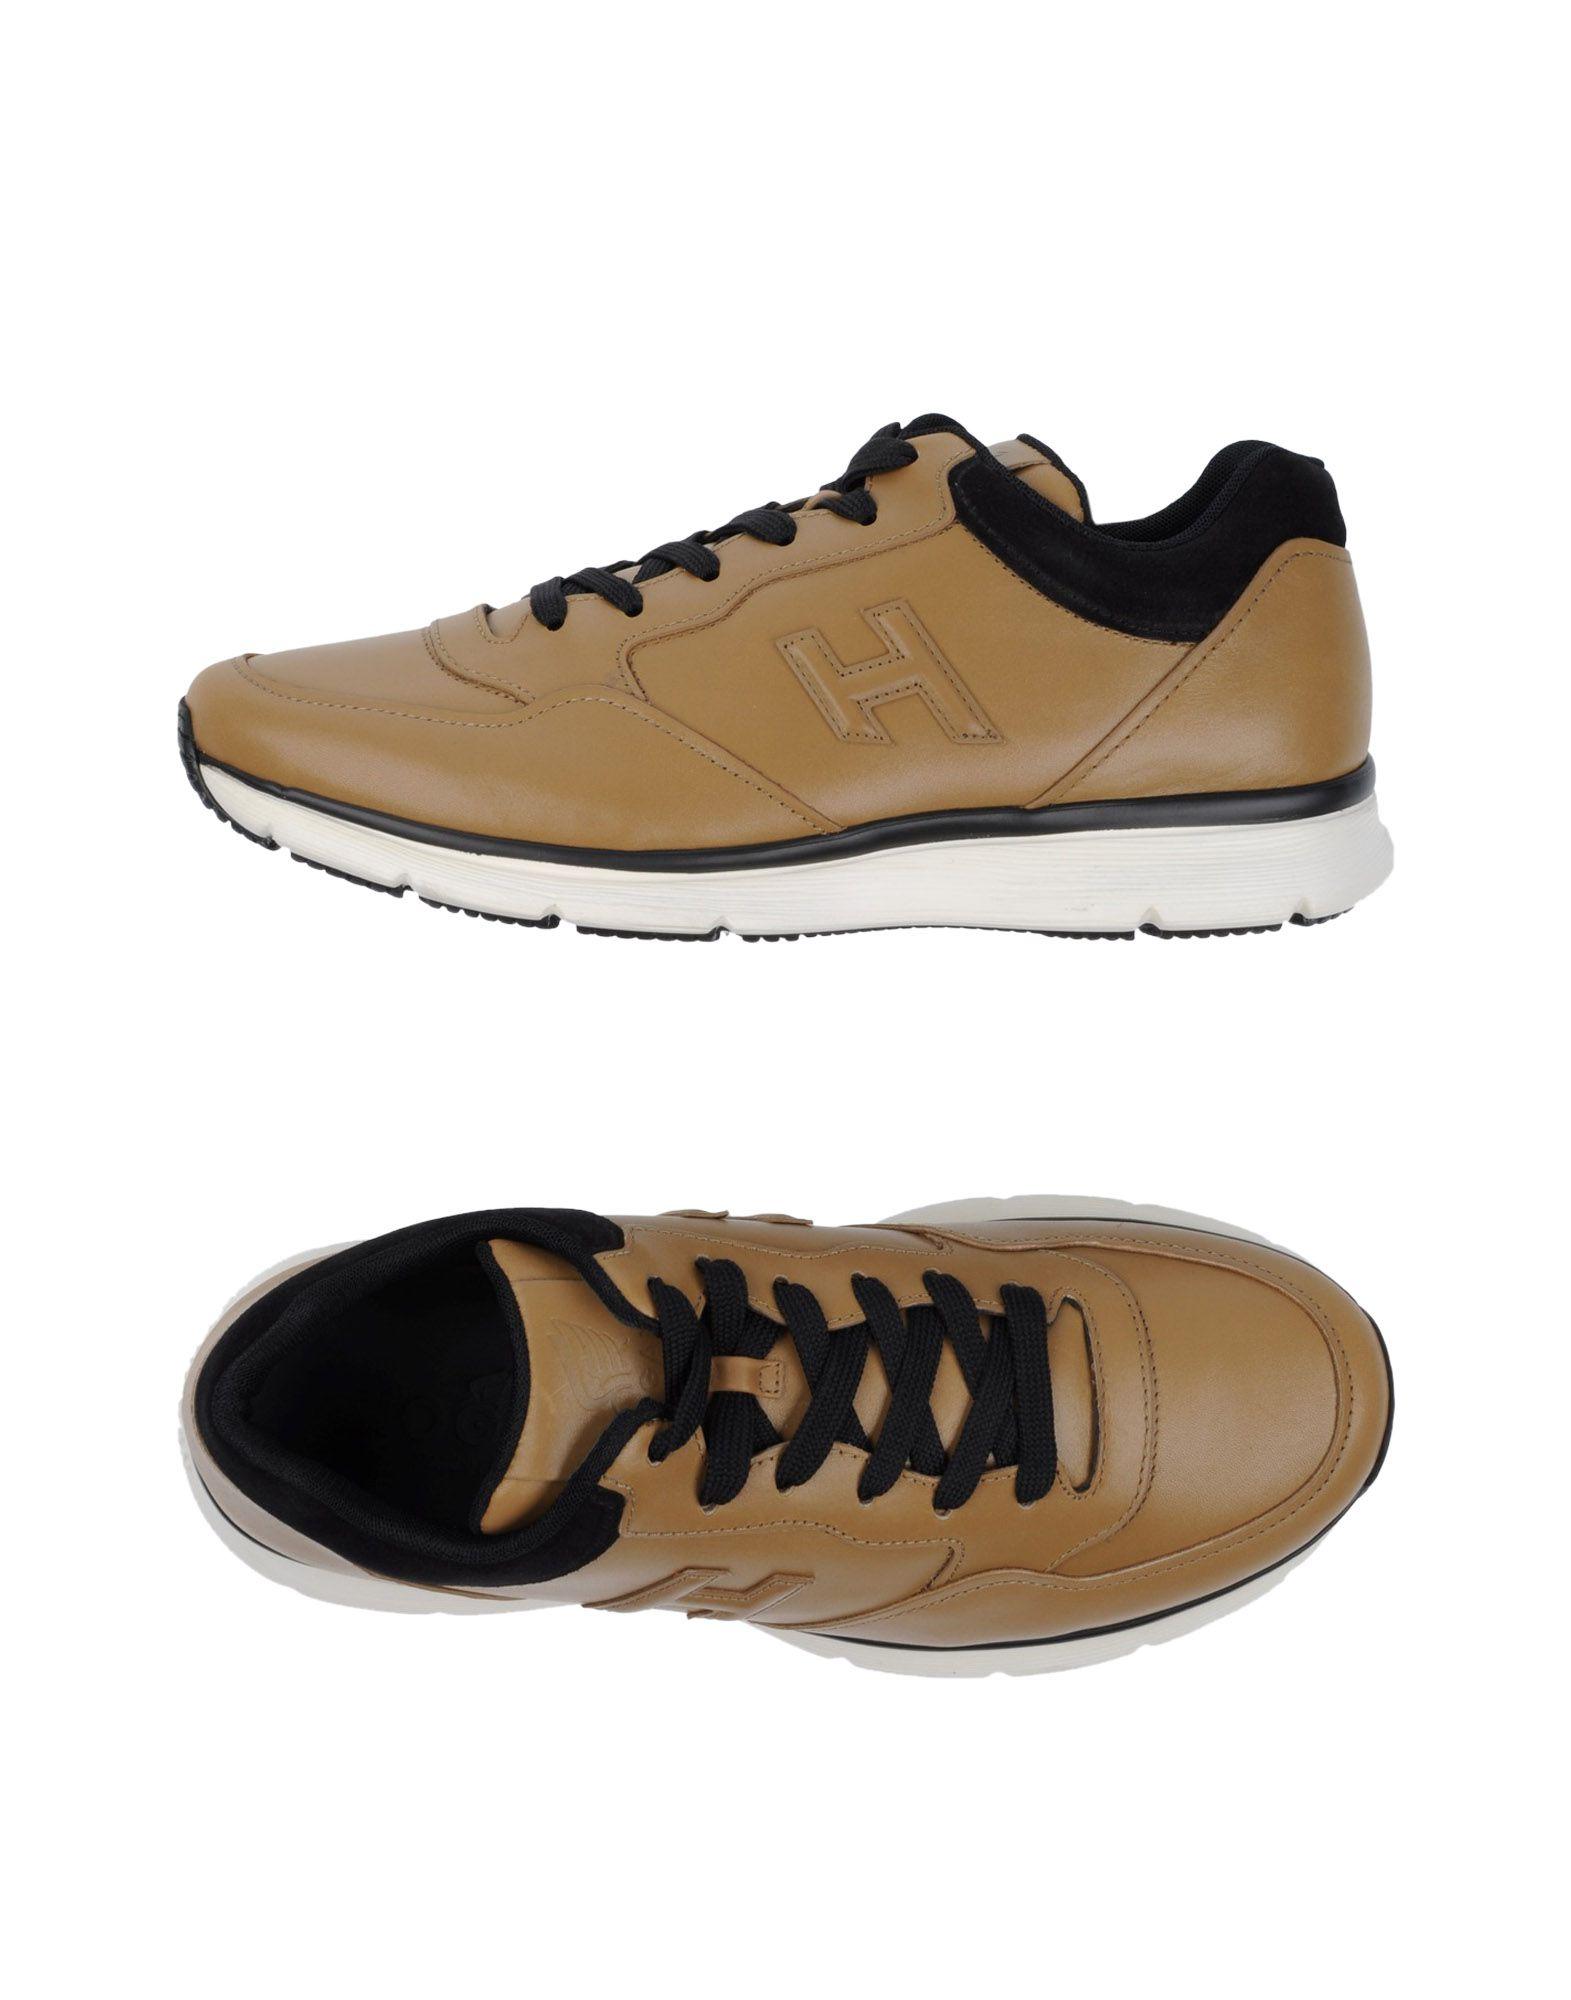 Hogan Sneakers Herren  11299244FF Gute Qualität beliebte Schuhe